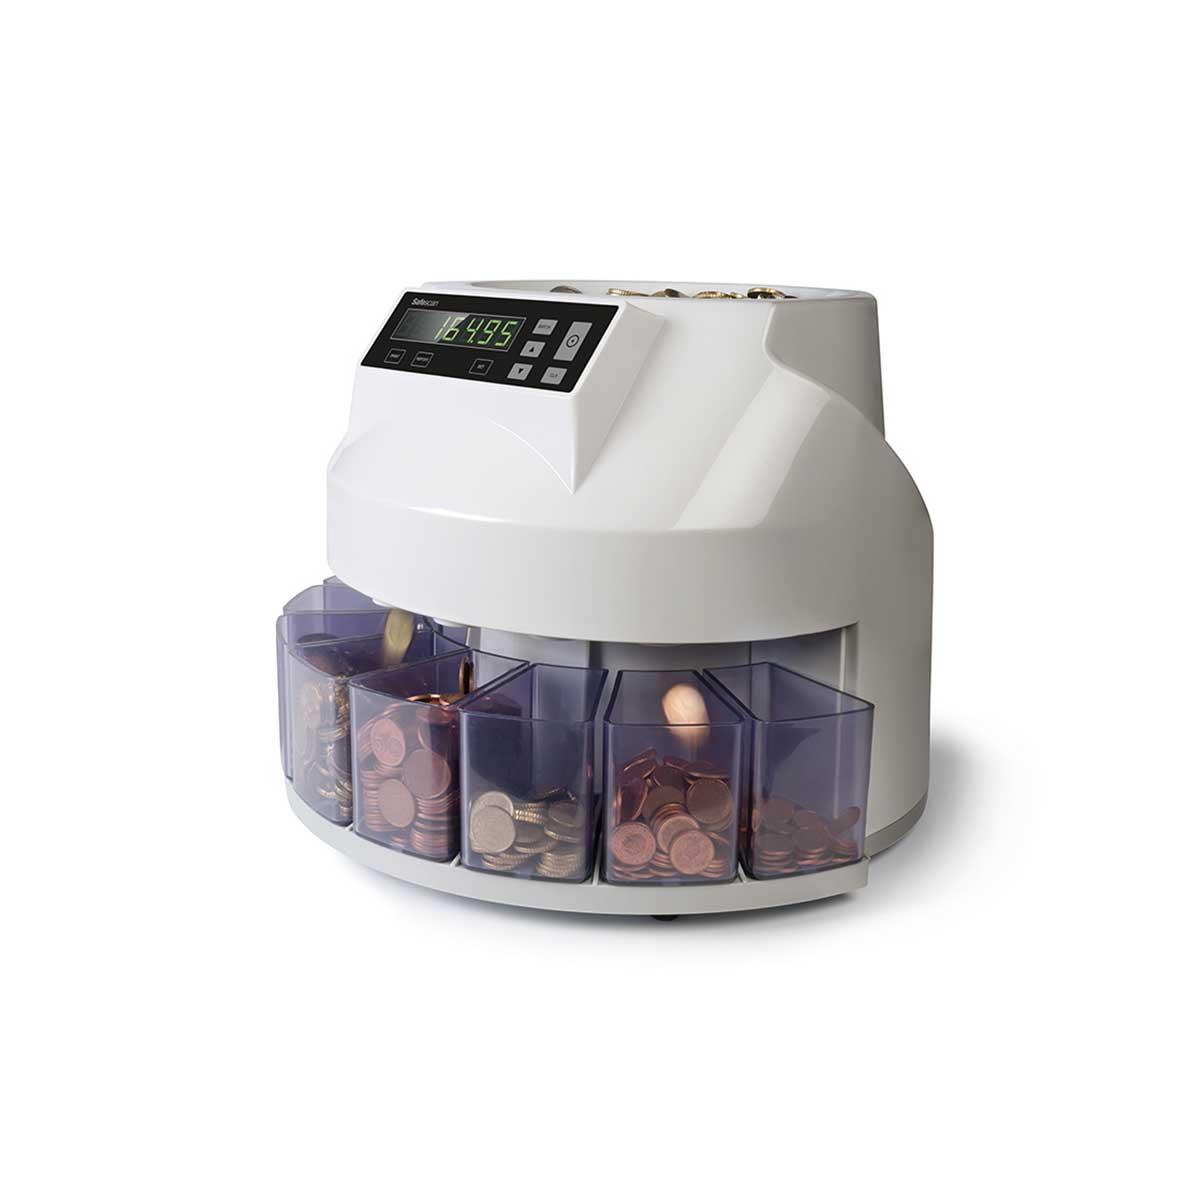 Safescan 1250 Euro Automatic Coin Counter and Sorter